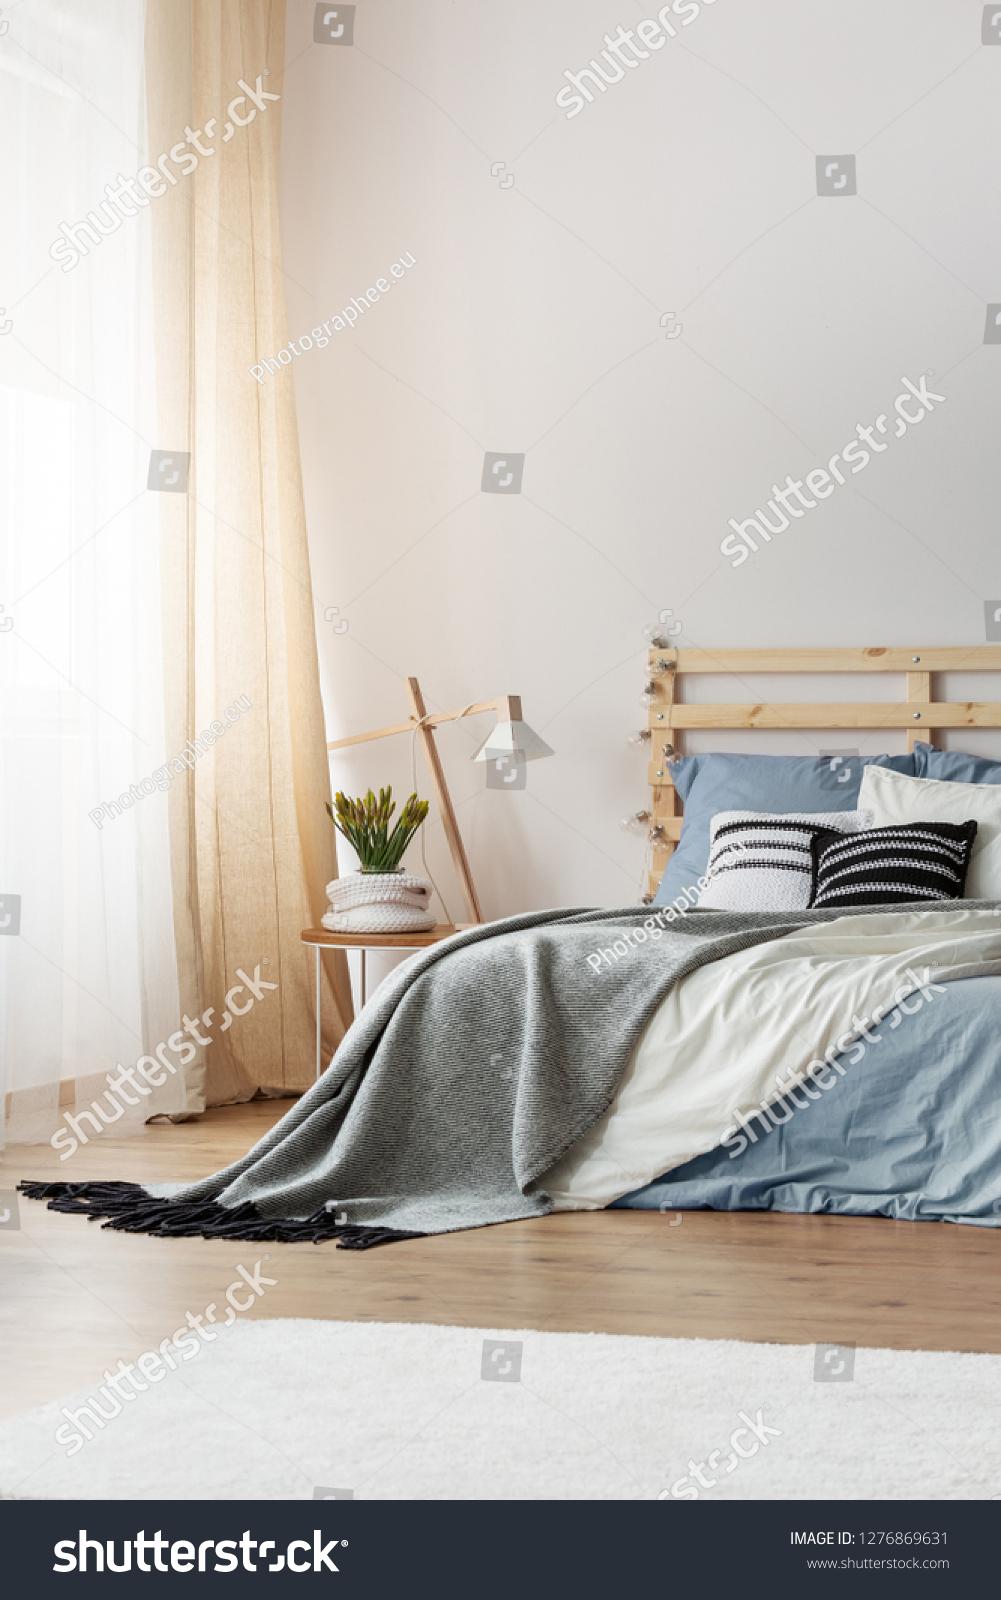 Light Blue Bedding Grey Blanket Black Stock Photo Edit Now 1276869631